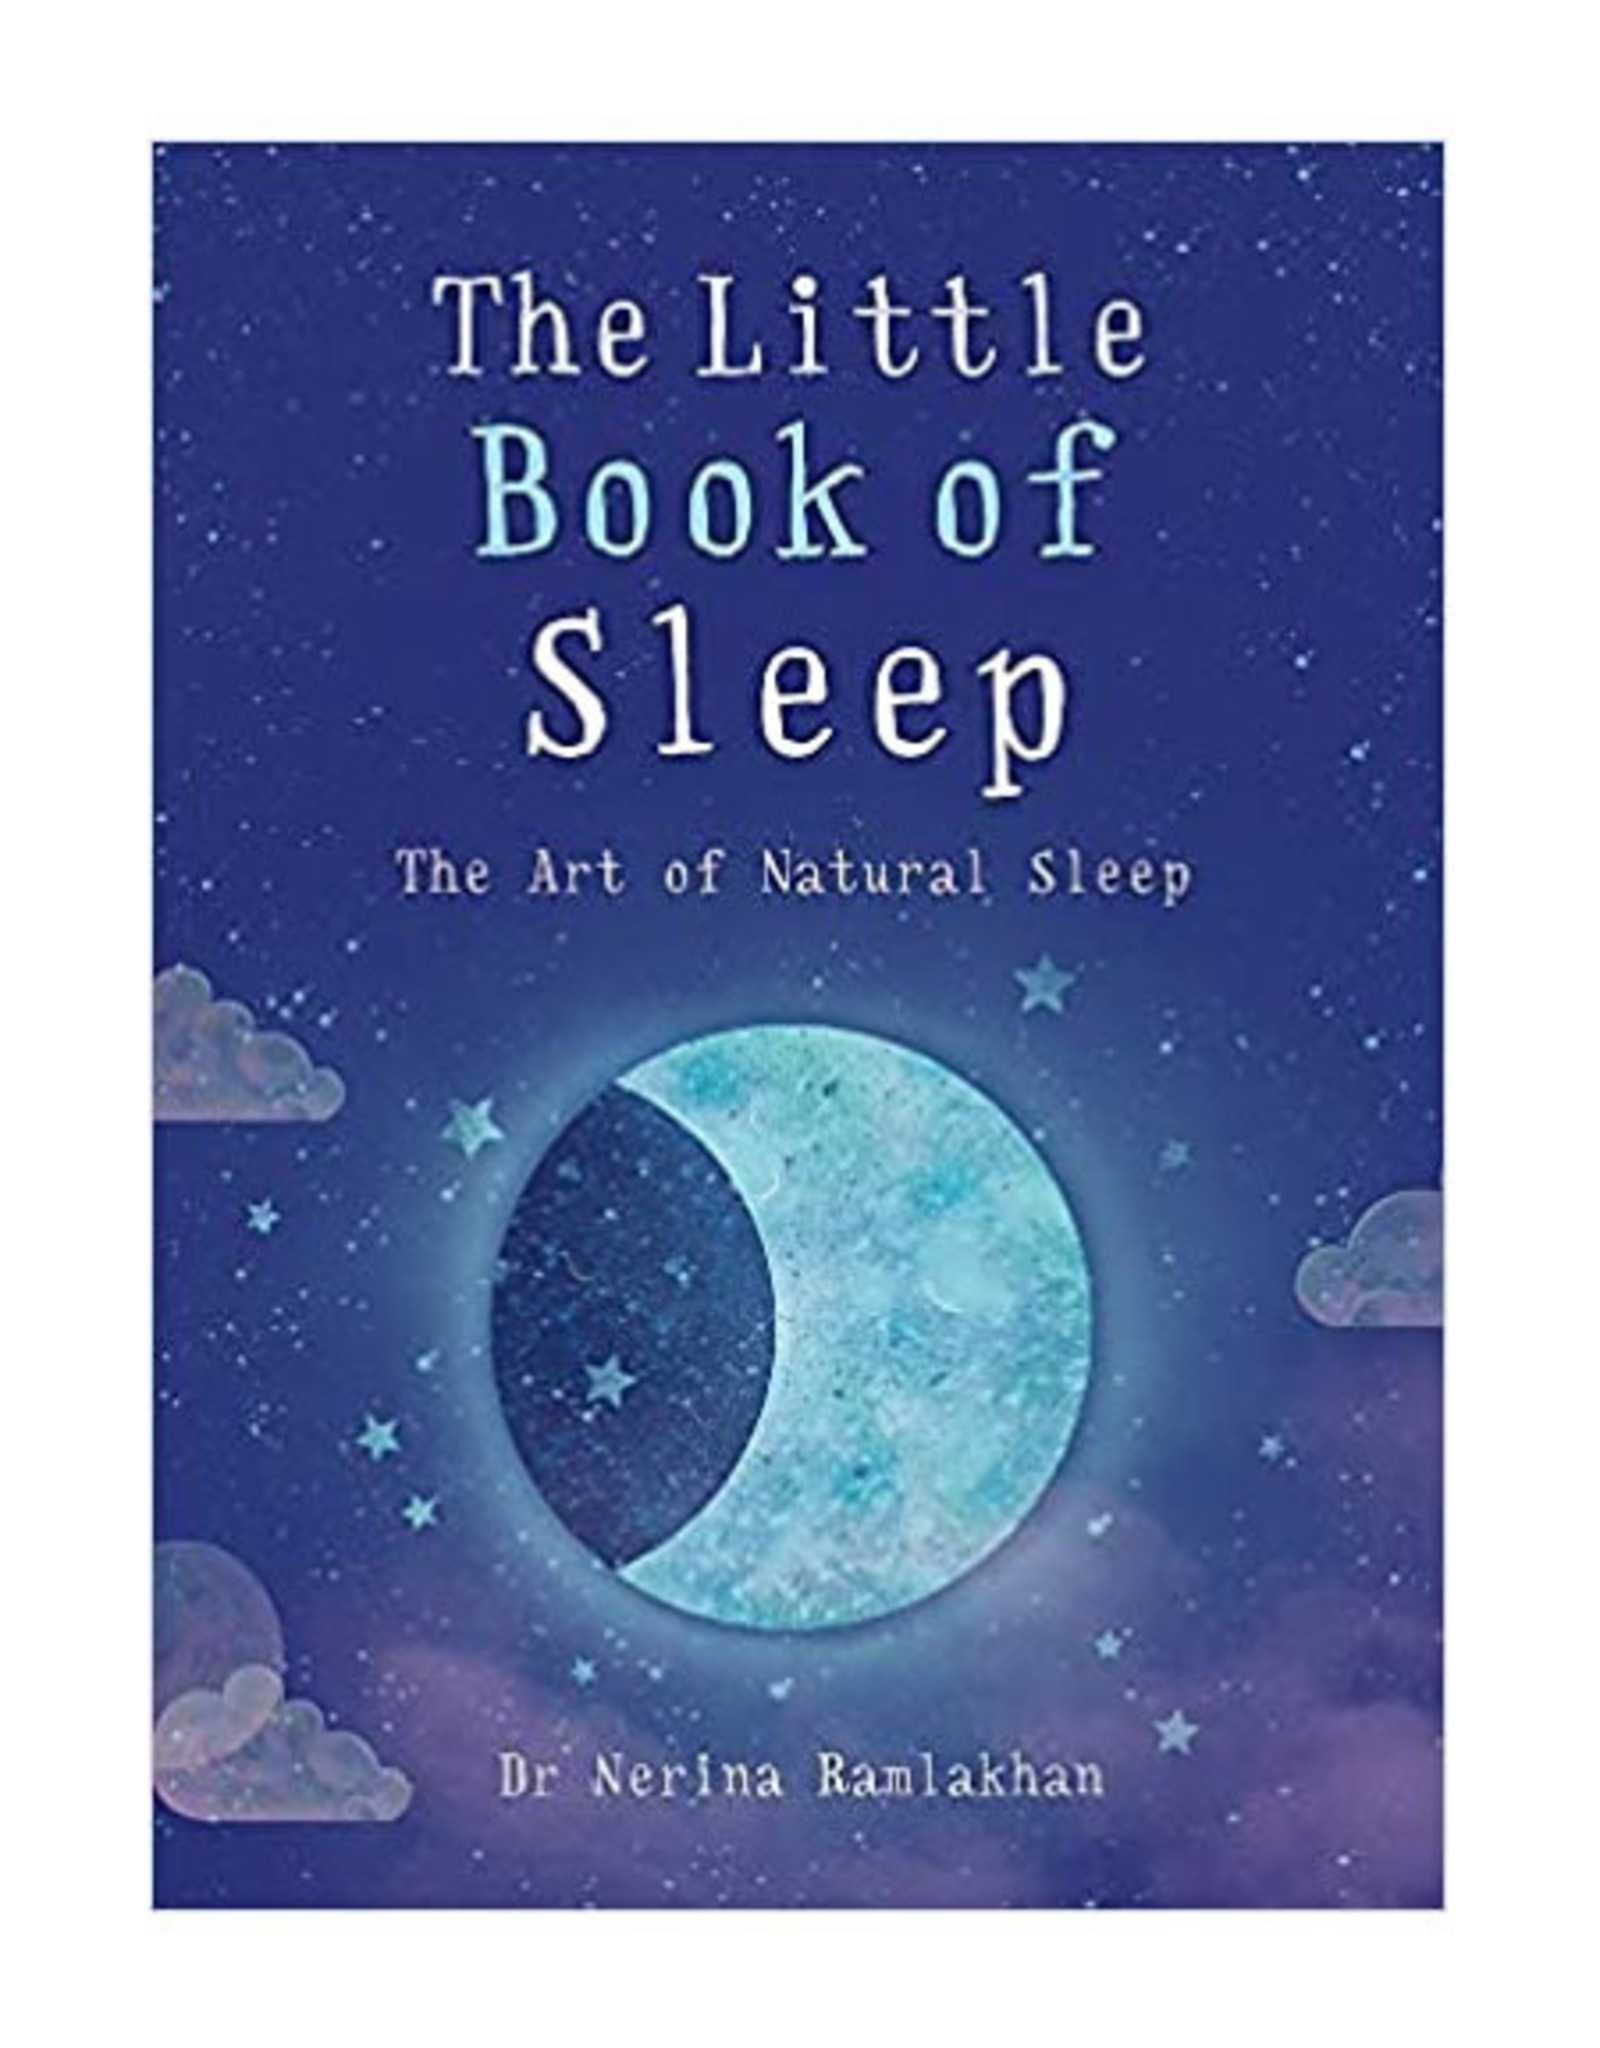 Book, The Little Book of Sleep